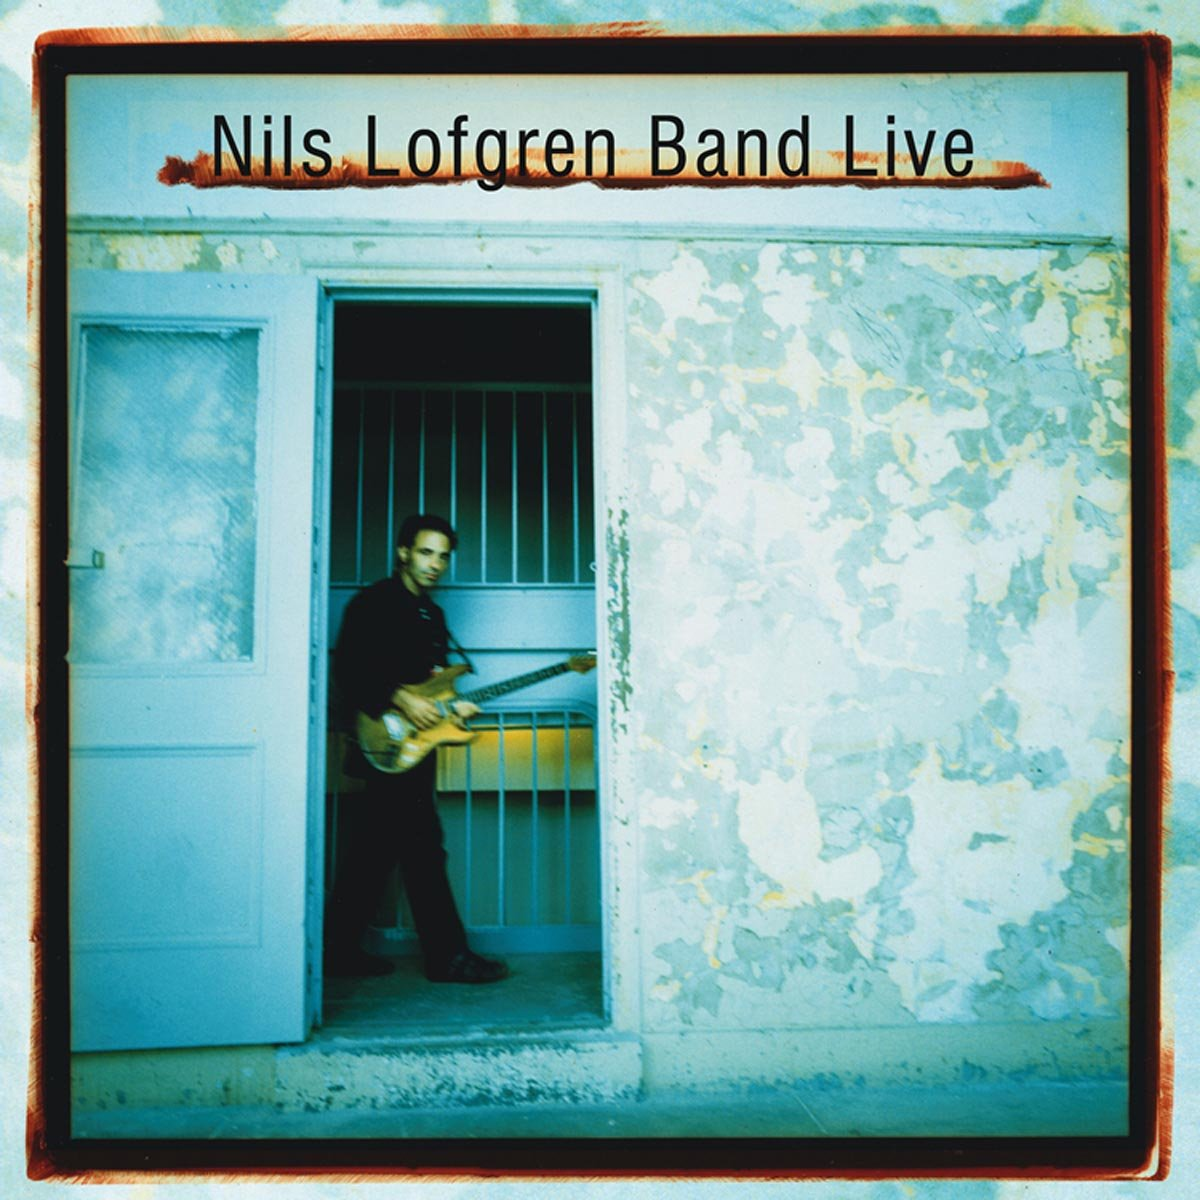 Nils Lofgren Band - Live